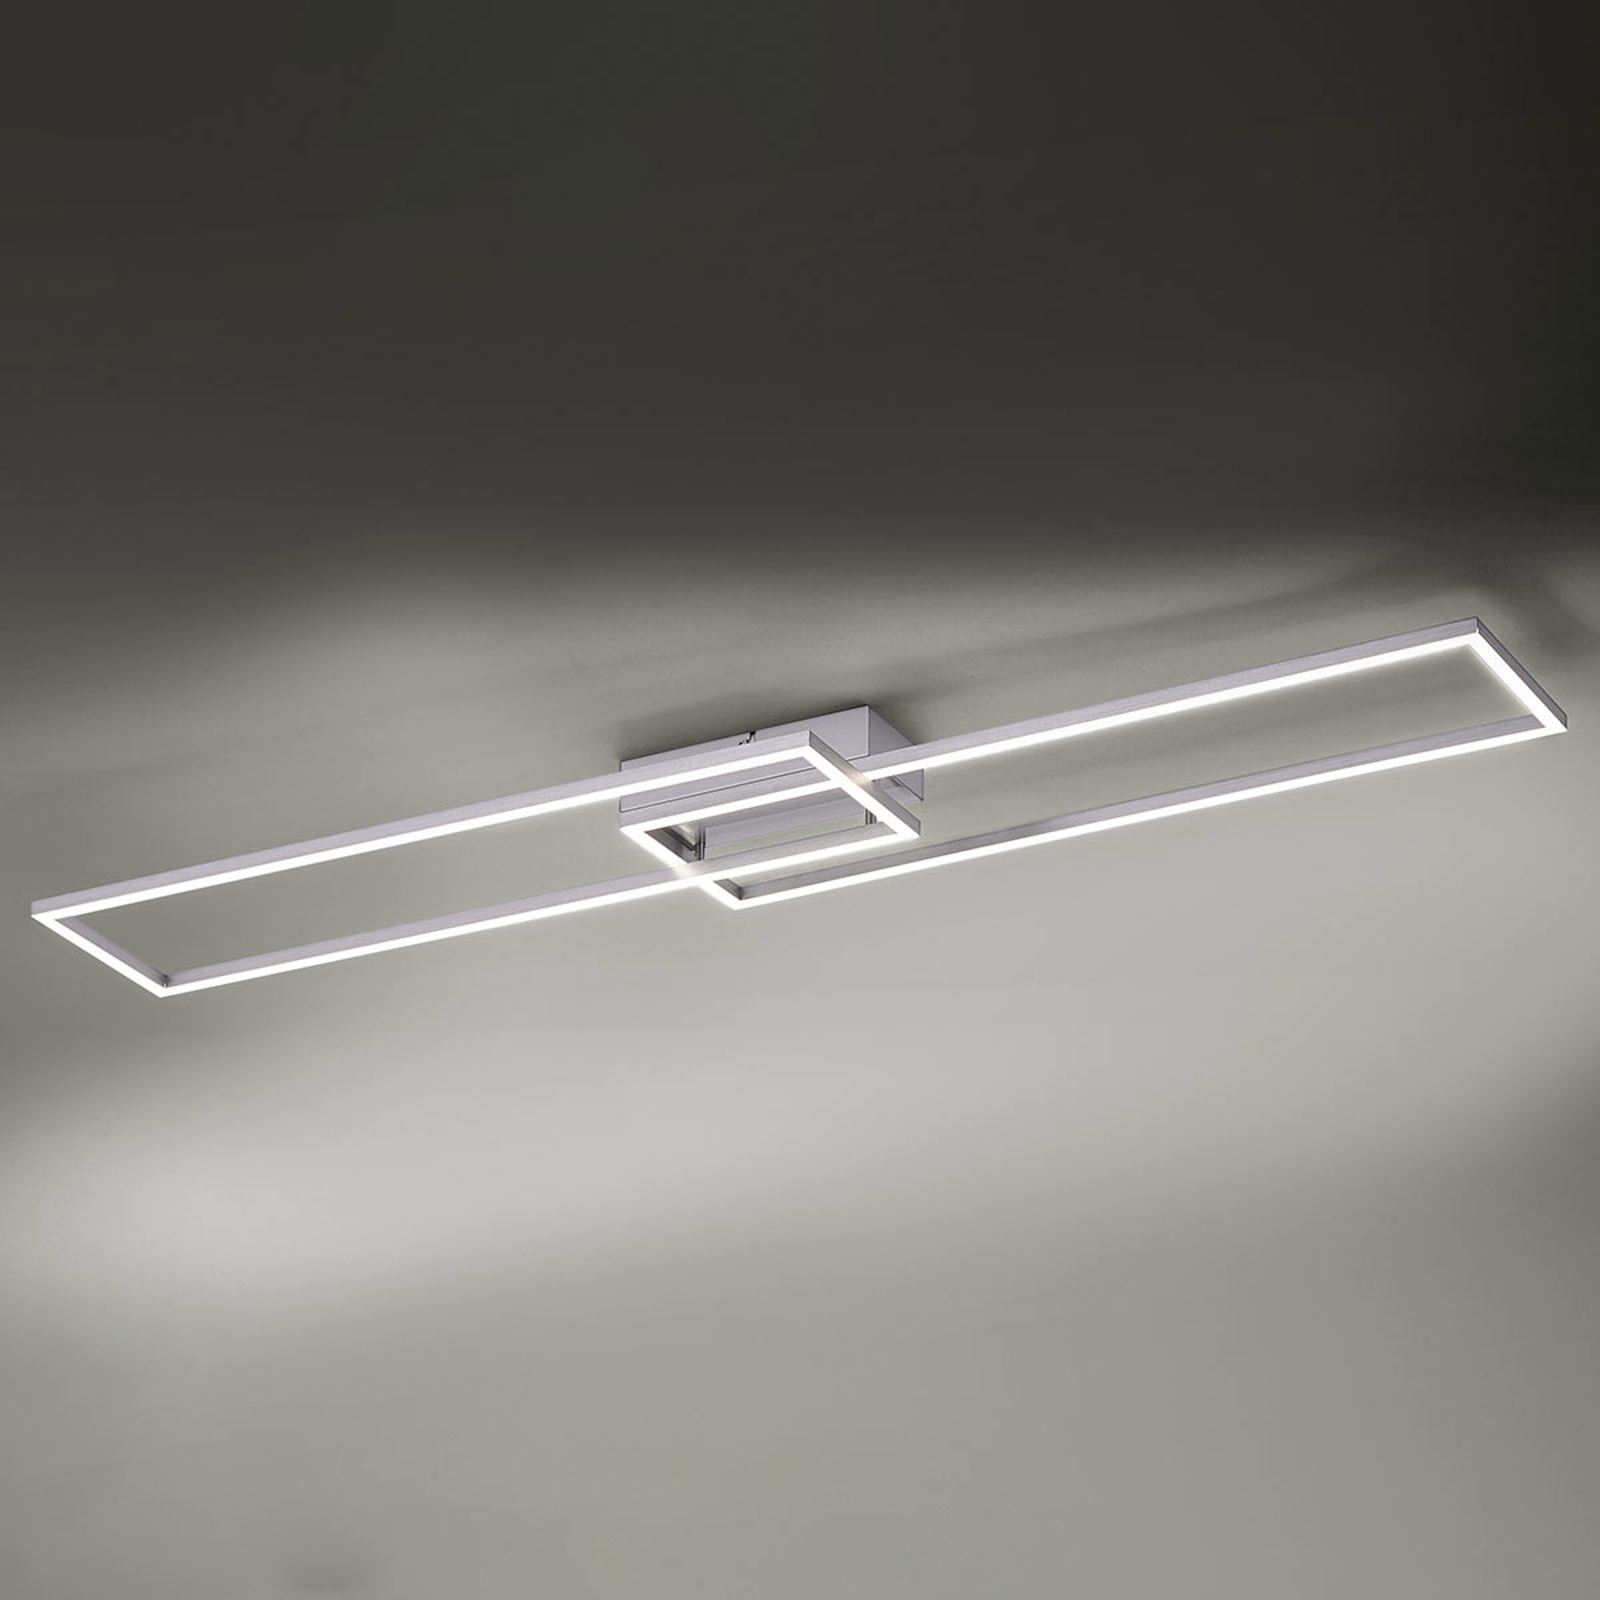 LED plafondlamp Iven met afstandsbediening 110 cm